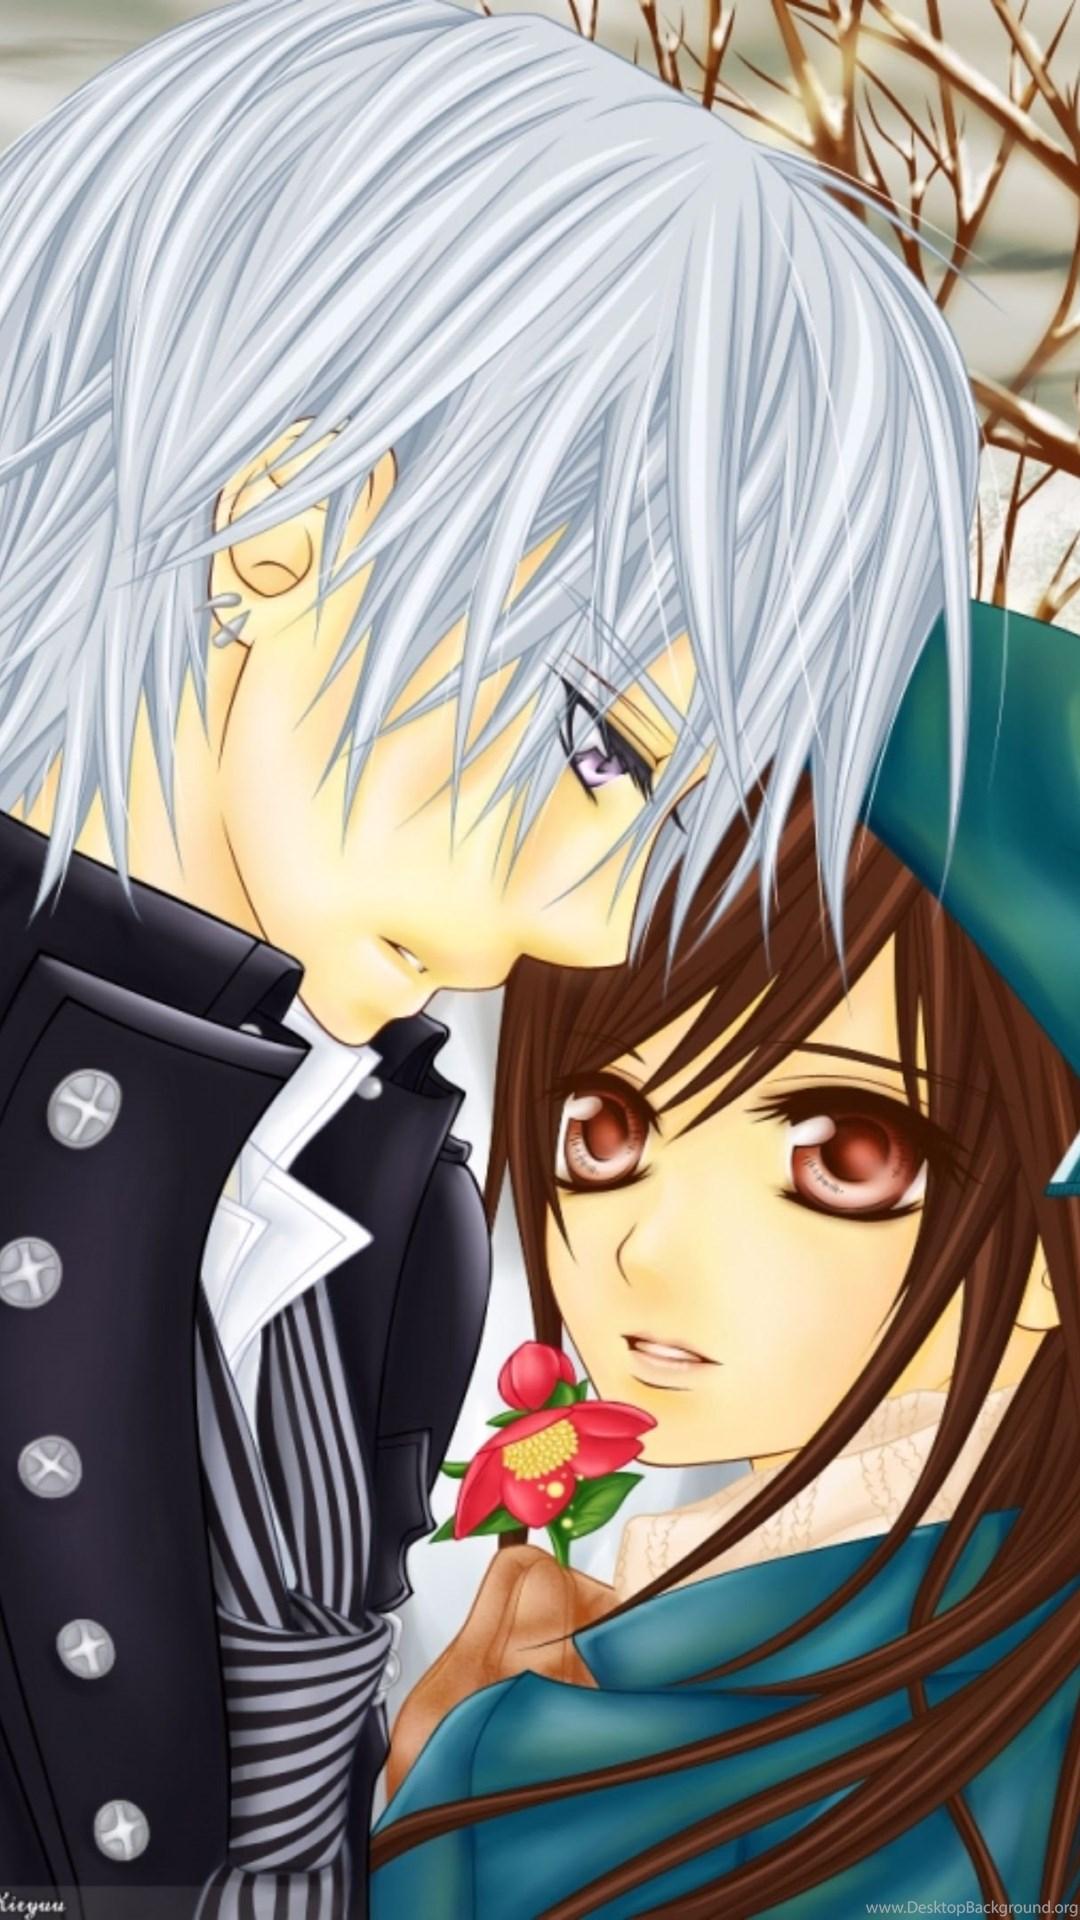 Anime Wallpaper Romance Hd - anime wallpaper